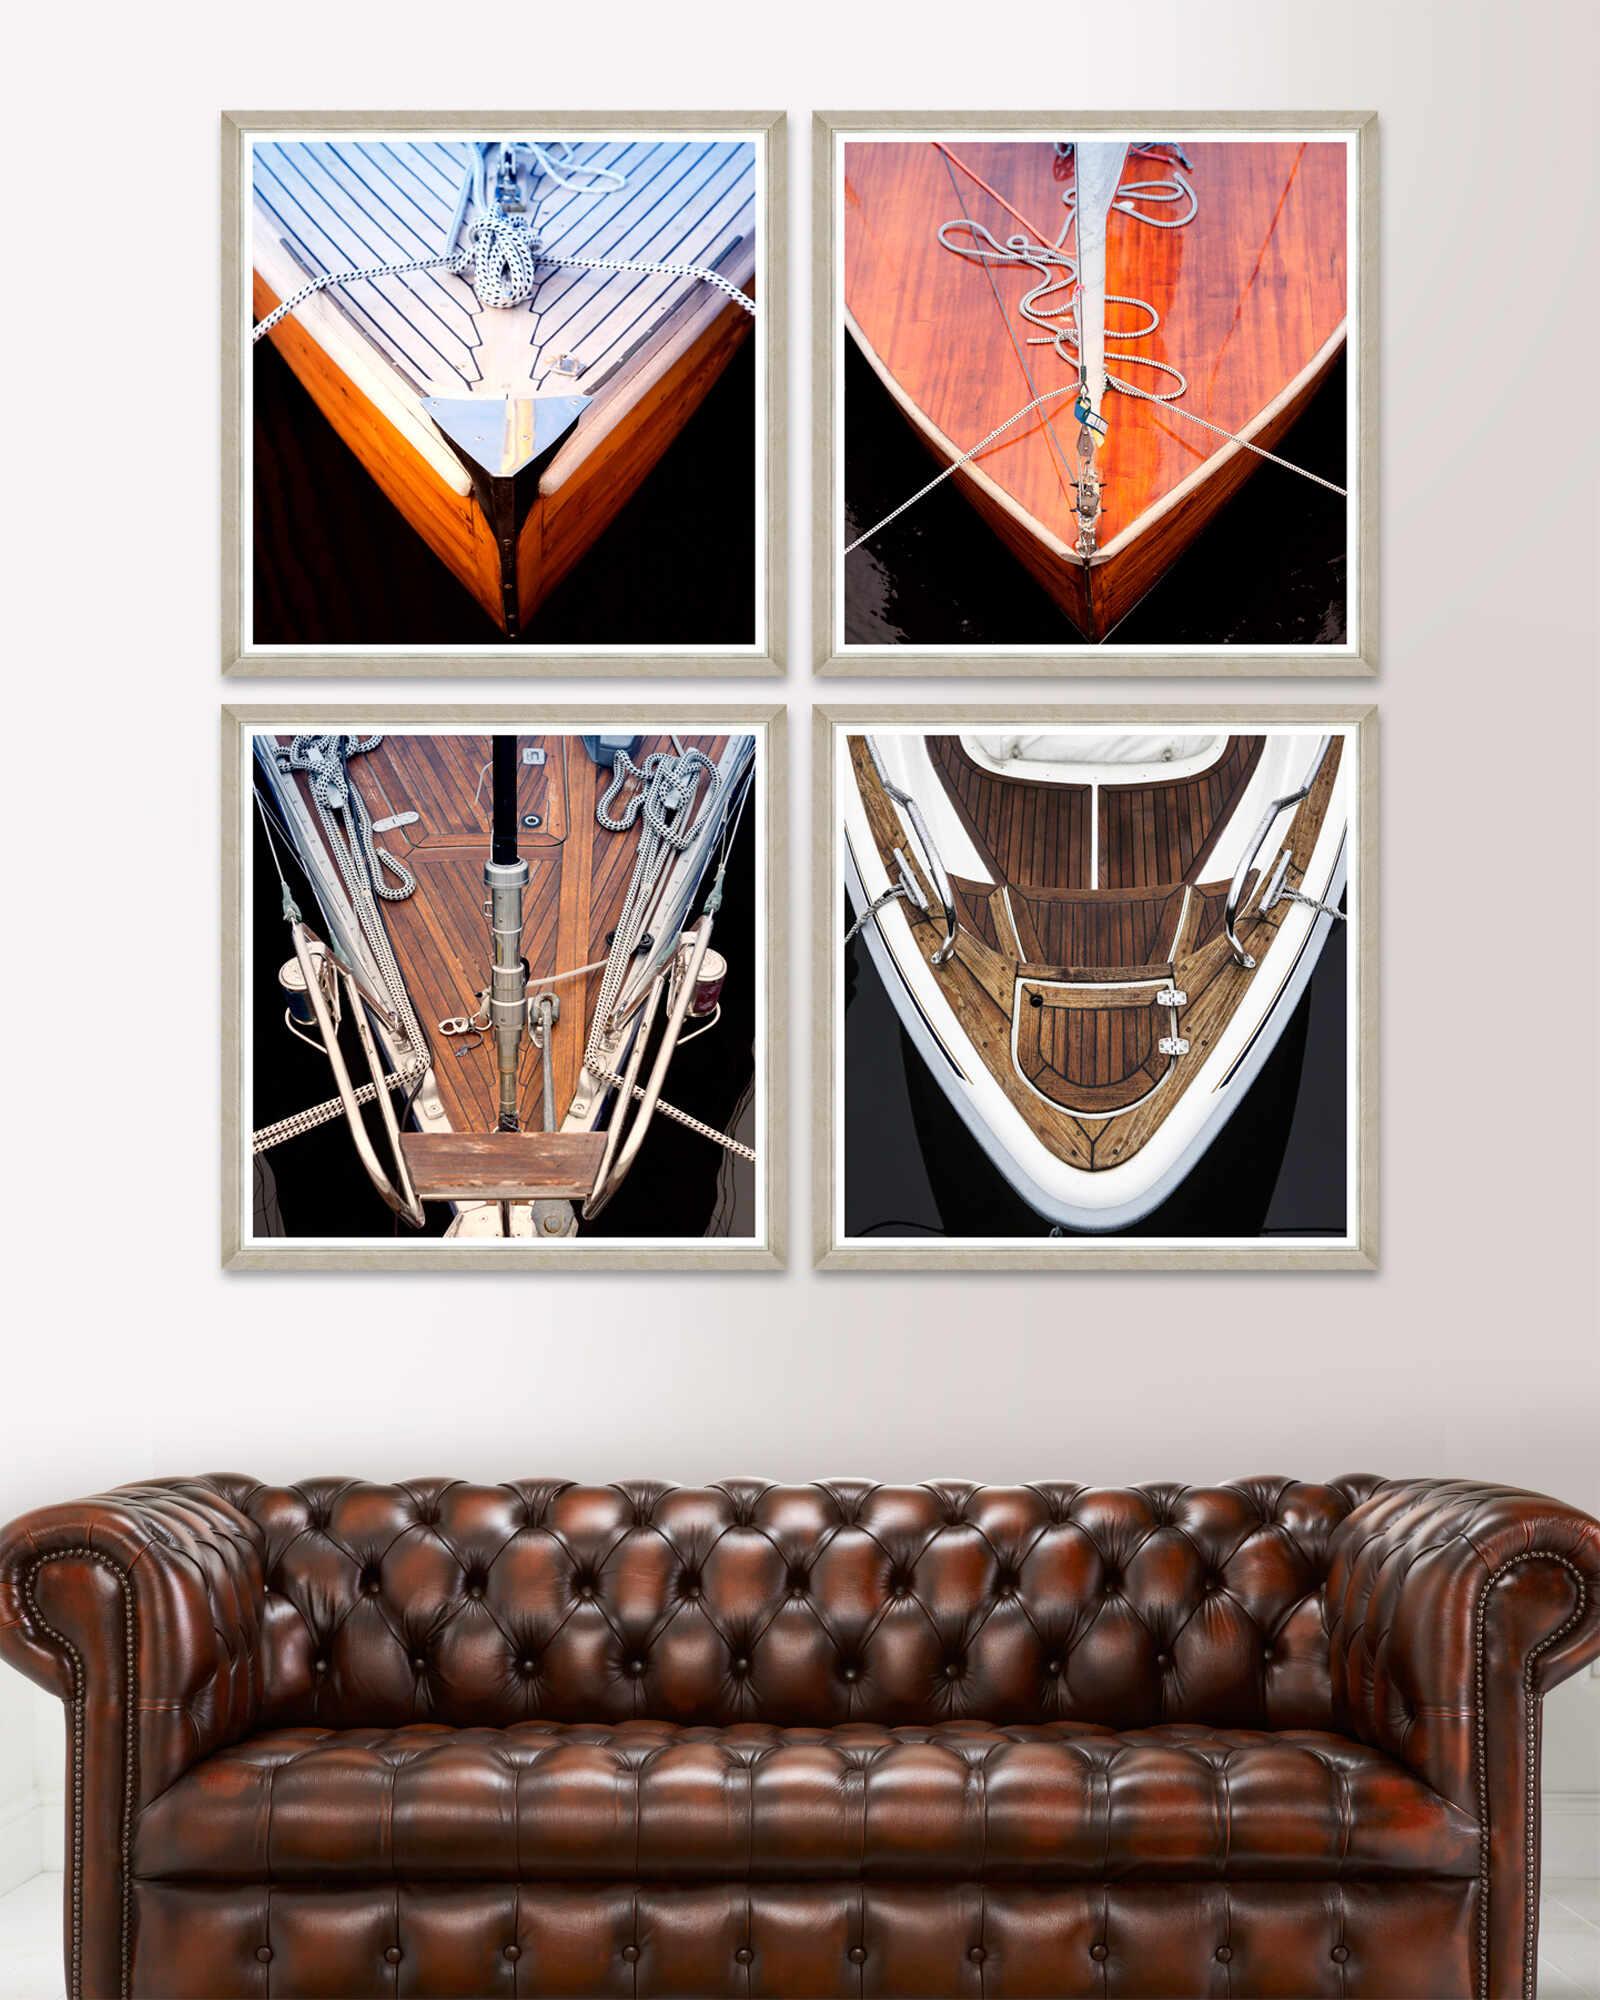 Tablou 4 piese Framed Art Wood Boat Fronts la pret 2739 lei